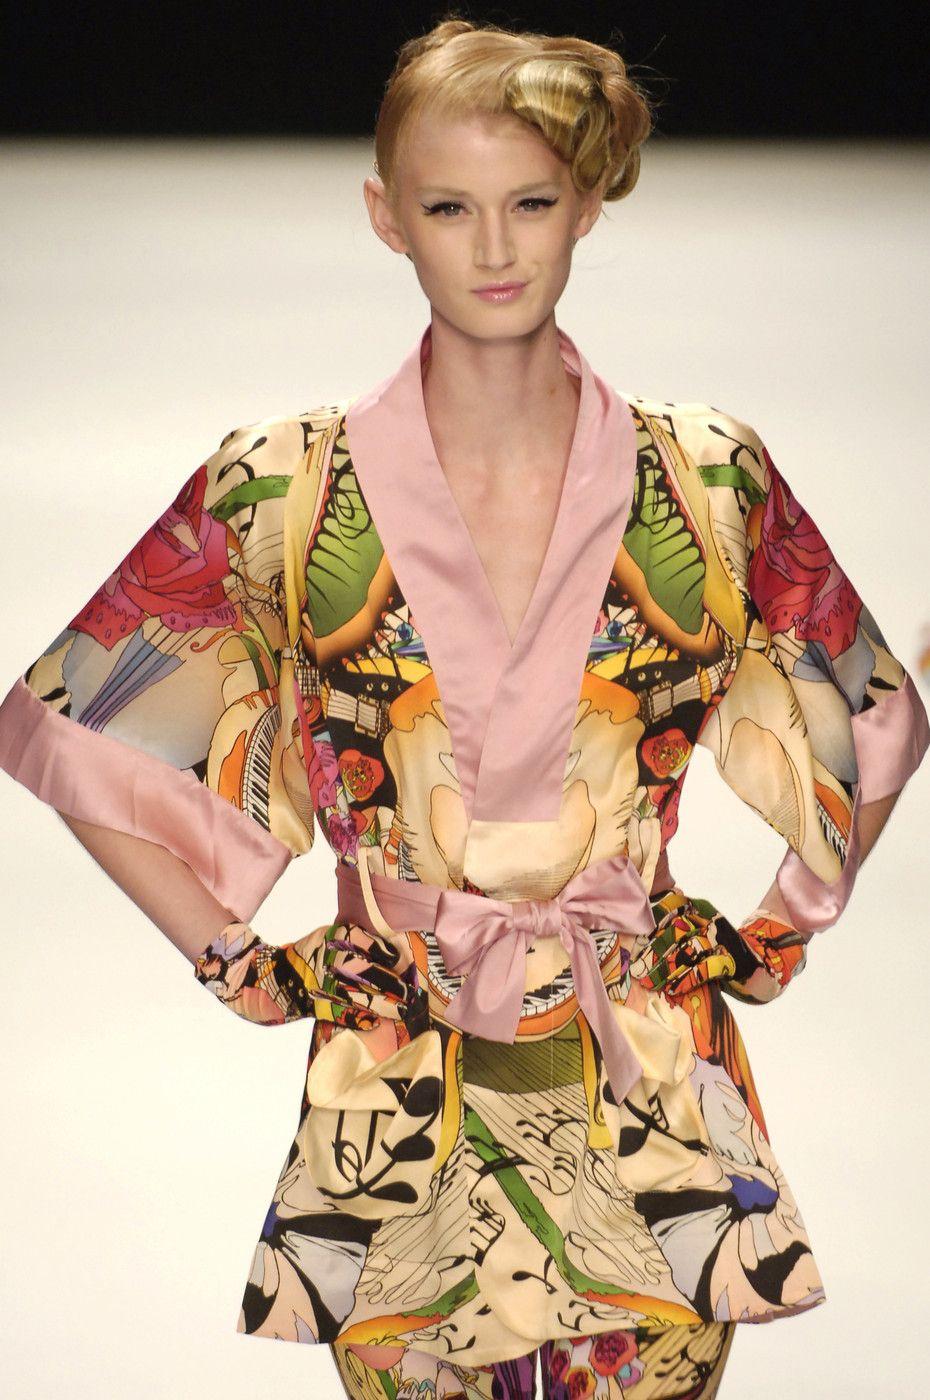 101 photos of Basso & Brooke at London Fashion Week Spring 2006.